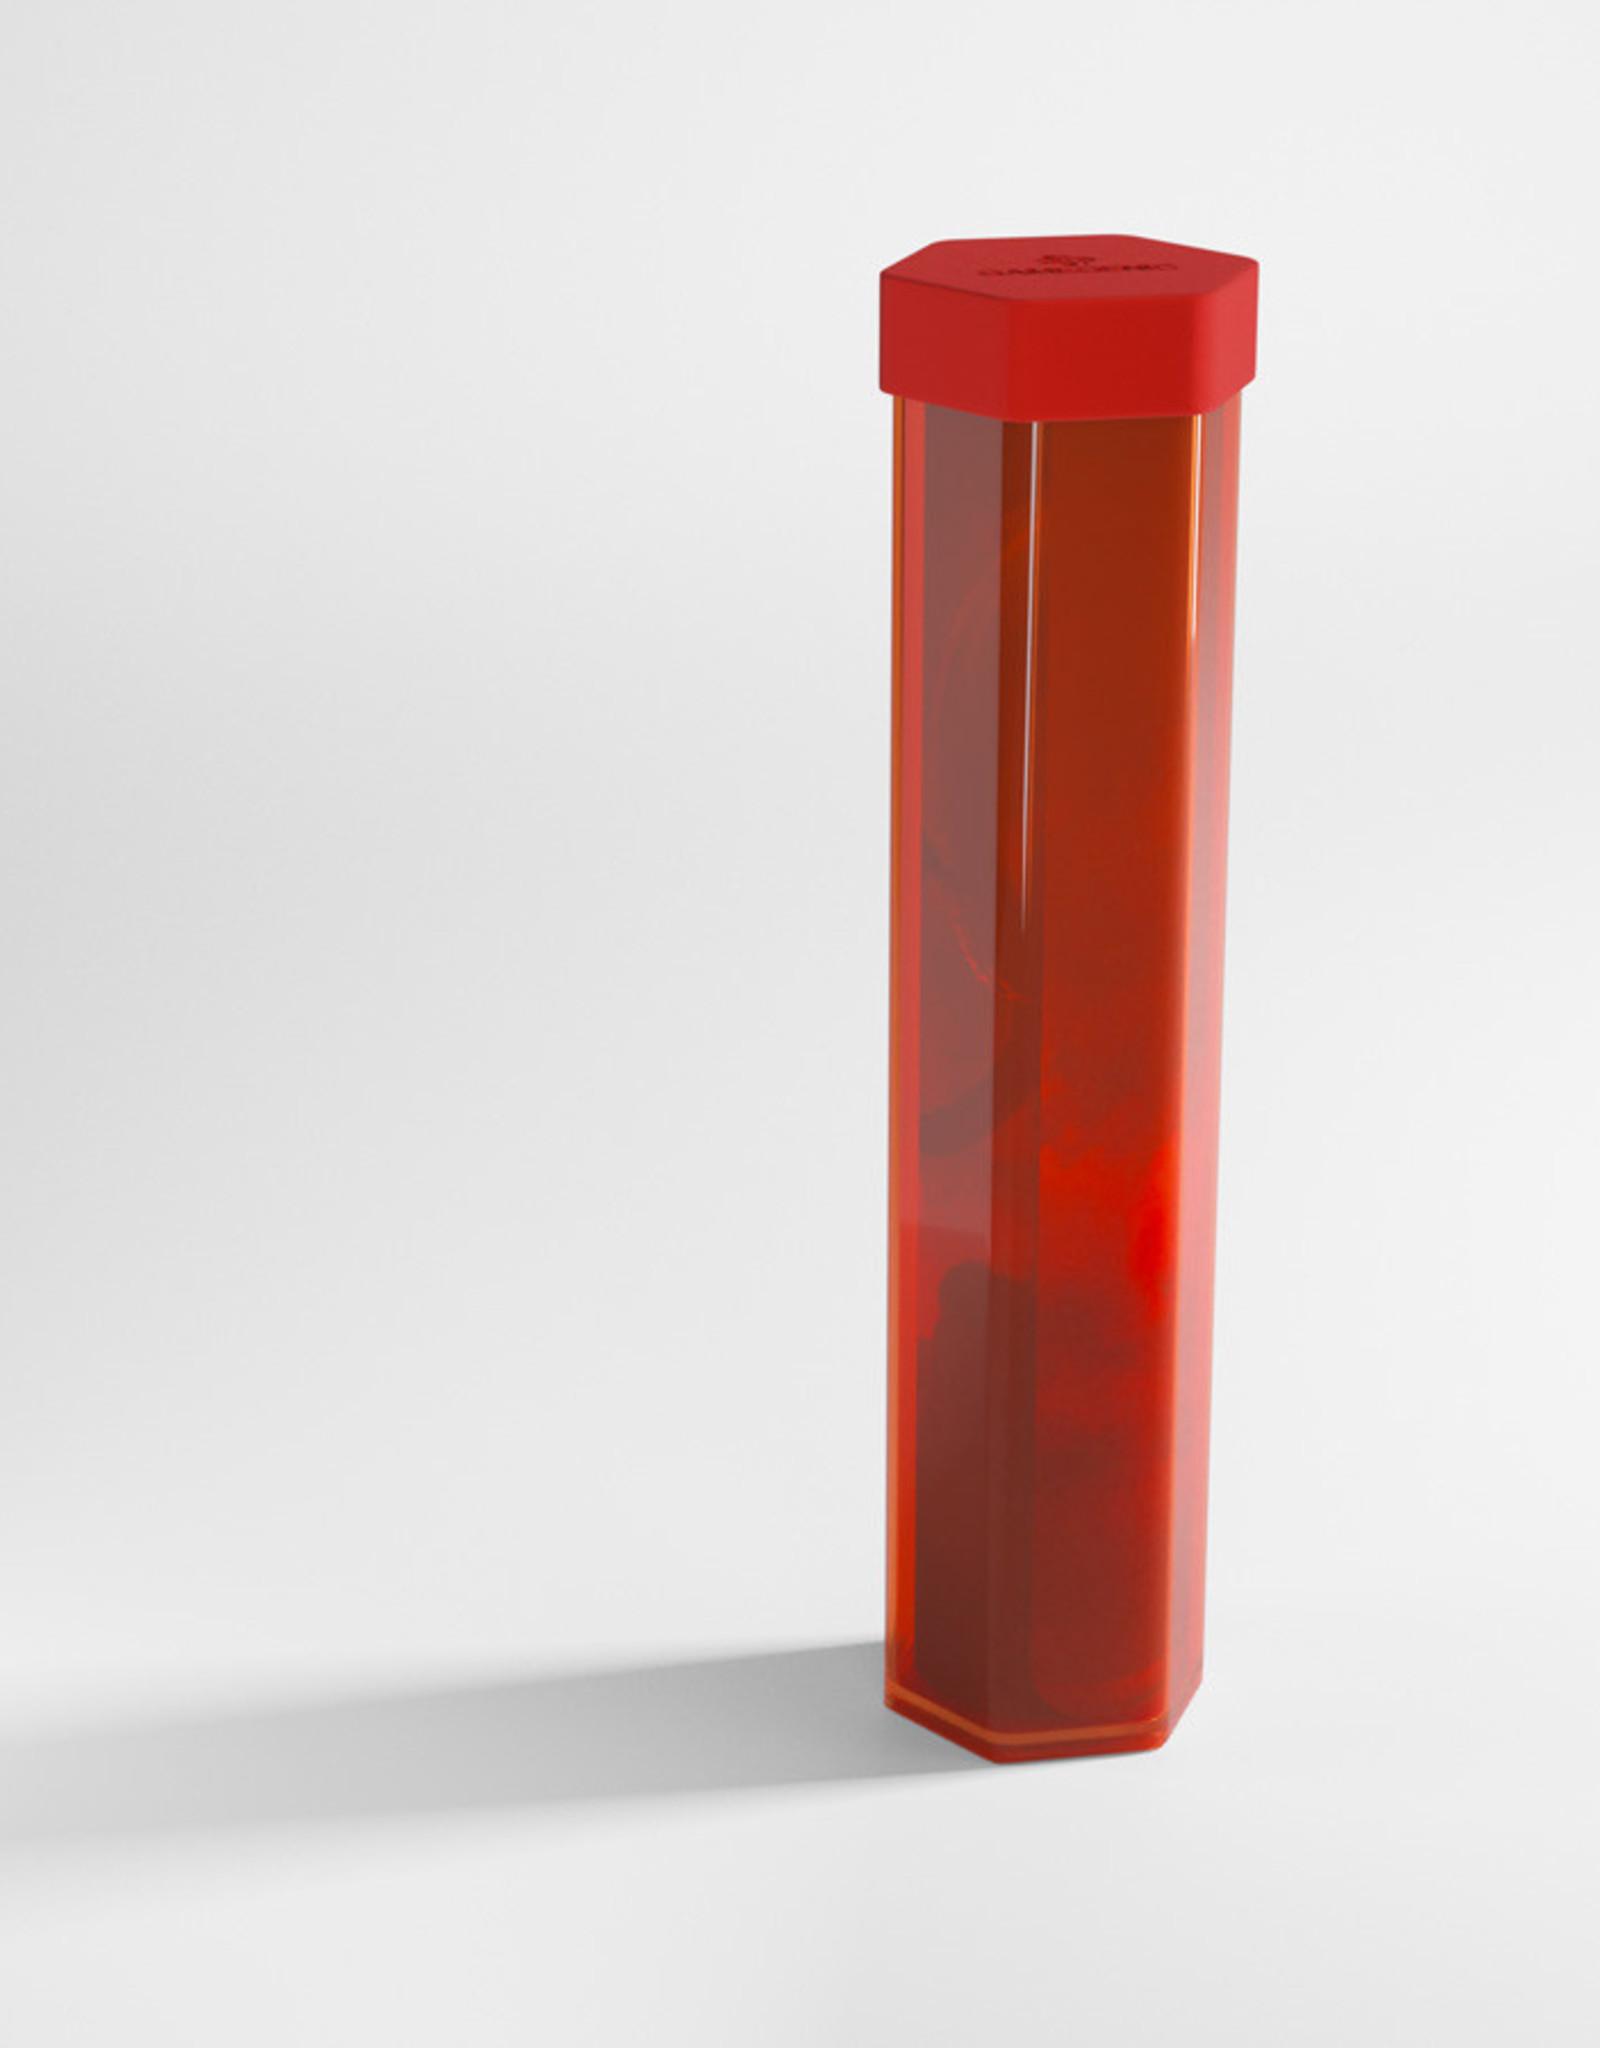 Playmat Tube: Red 7.5cm x 38.5cm